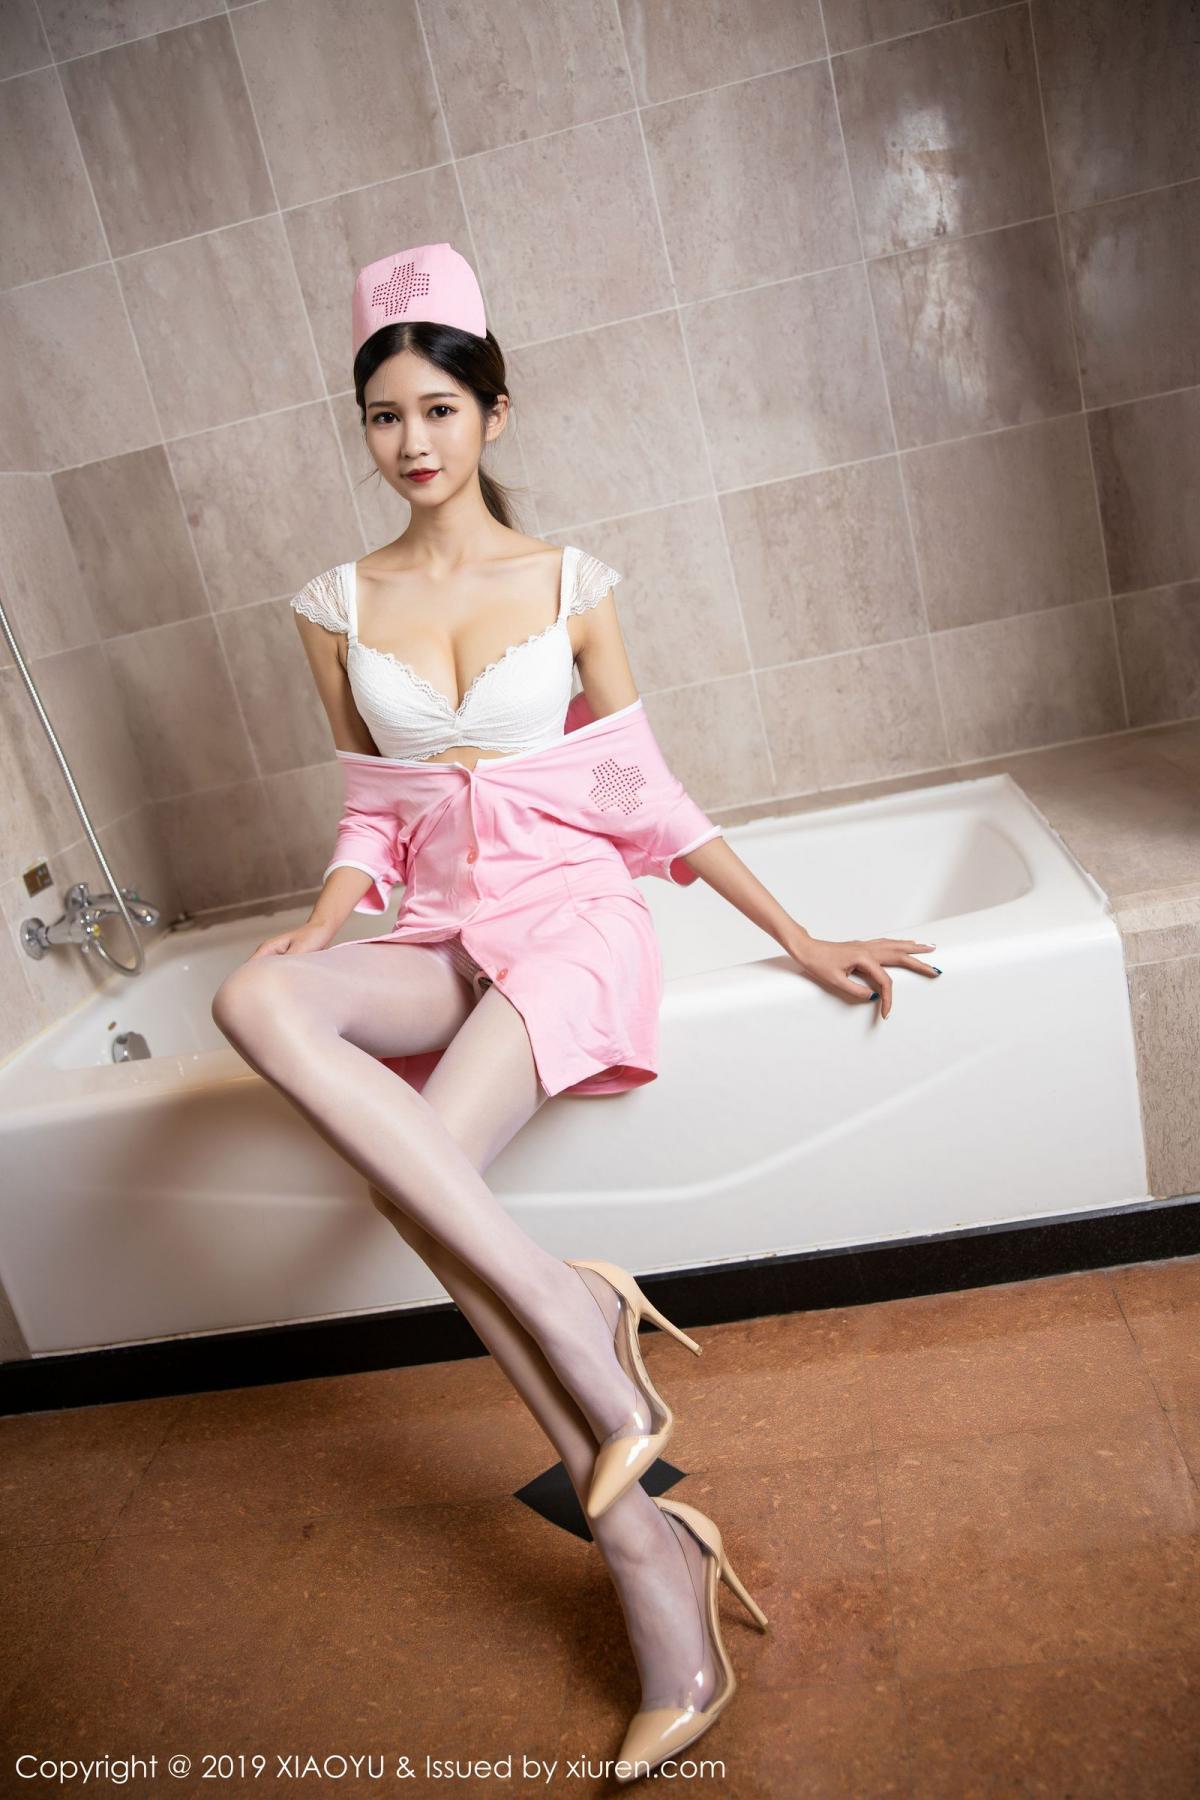 [XiaoYu] Vol.218 Cheng Cheng Cheng 18P, Cheng Cheng Cheng, Nurse, Tall, XiaoYu